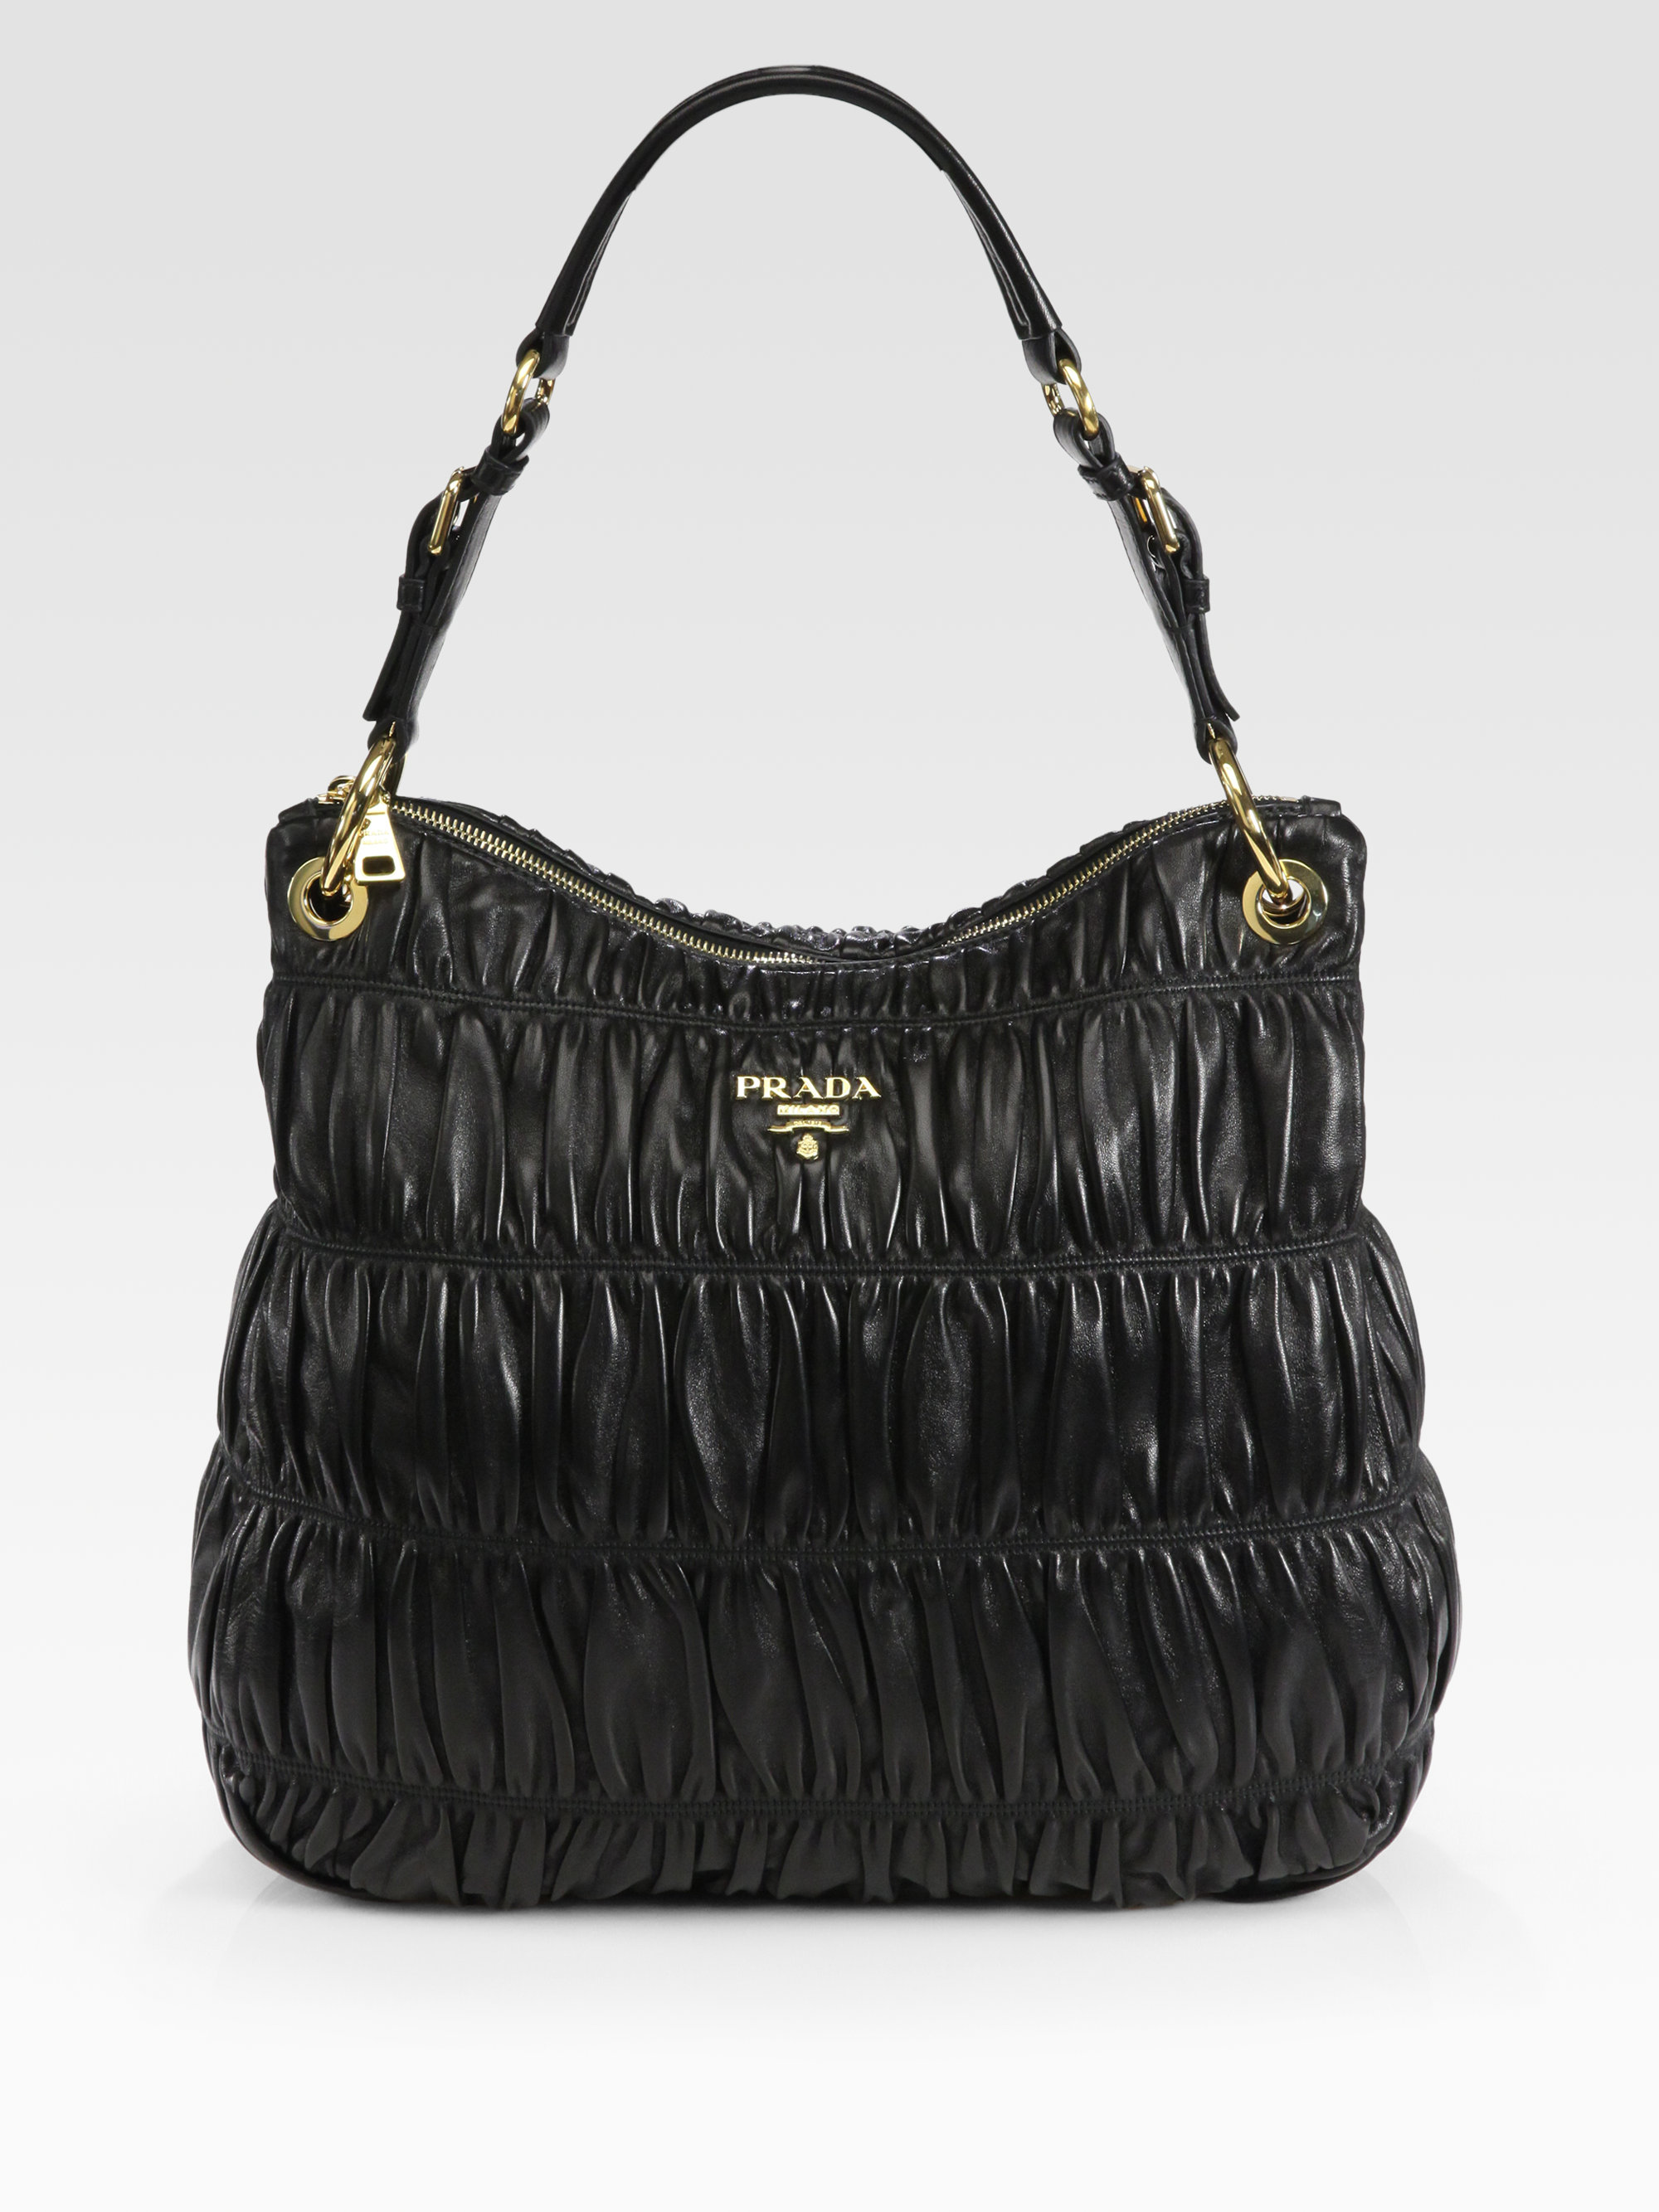 pranda bag - prada nappa bucket bag, prada multicolor purse